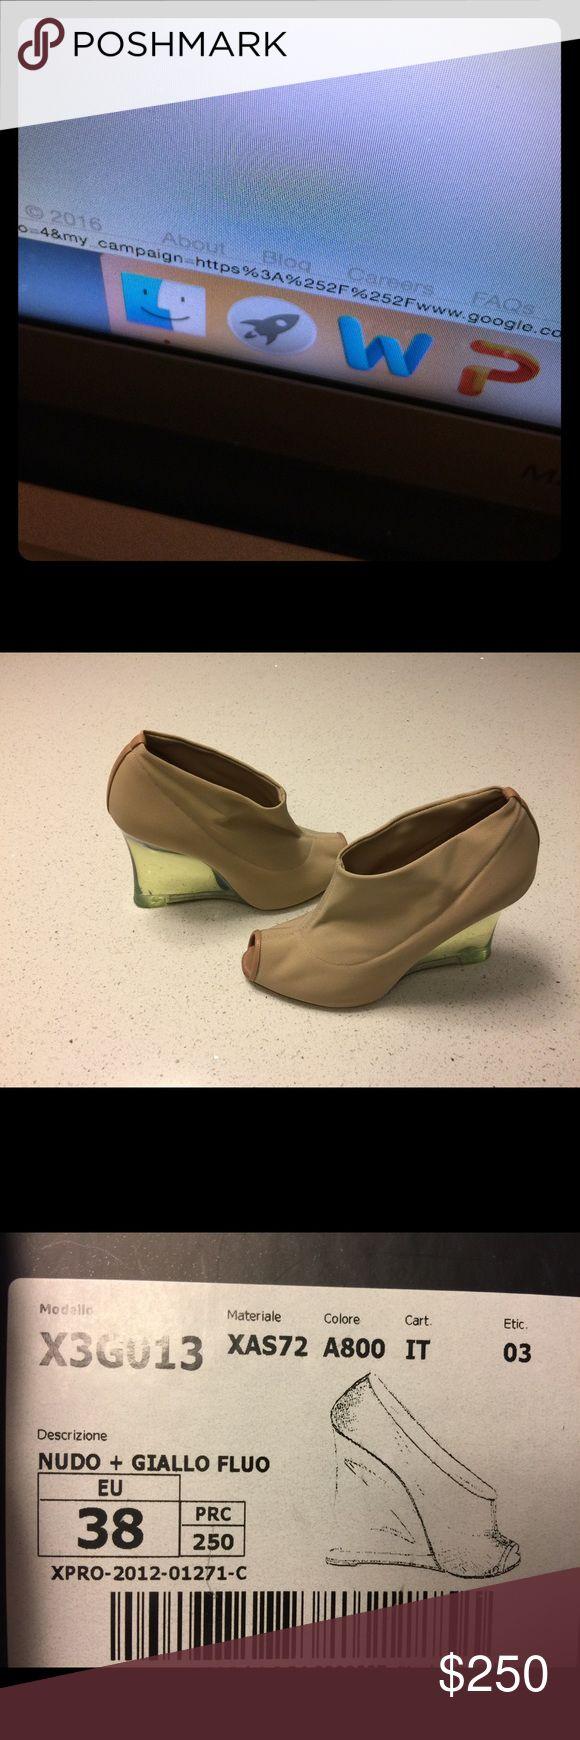 Emporio Armani Nudo + Giallo Fluo 38 Nude with acrylic wedge Emporio Armani Shoes Wedges